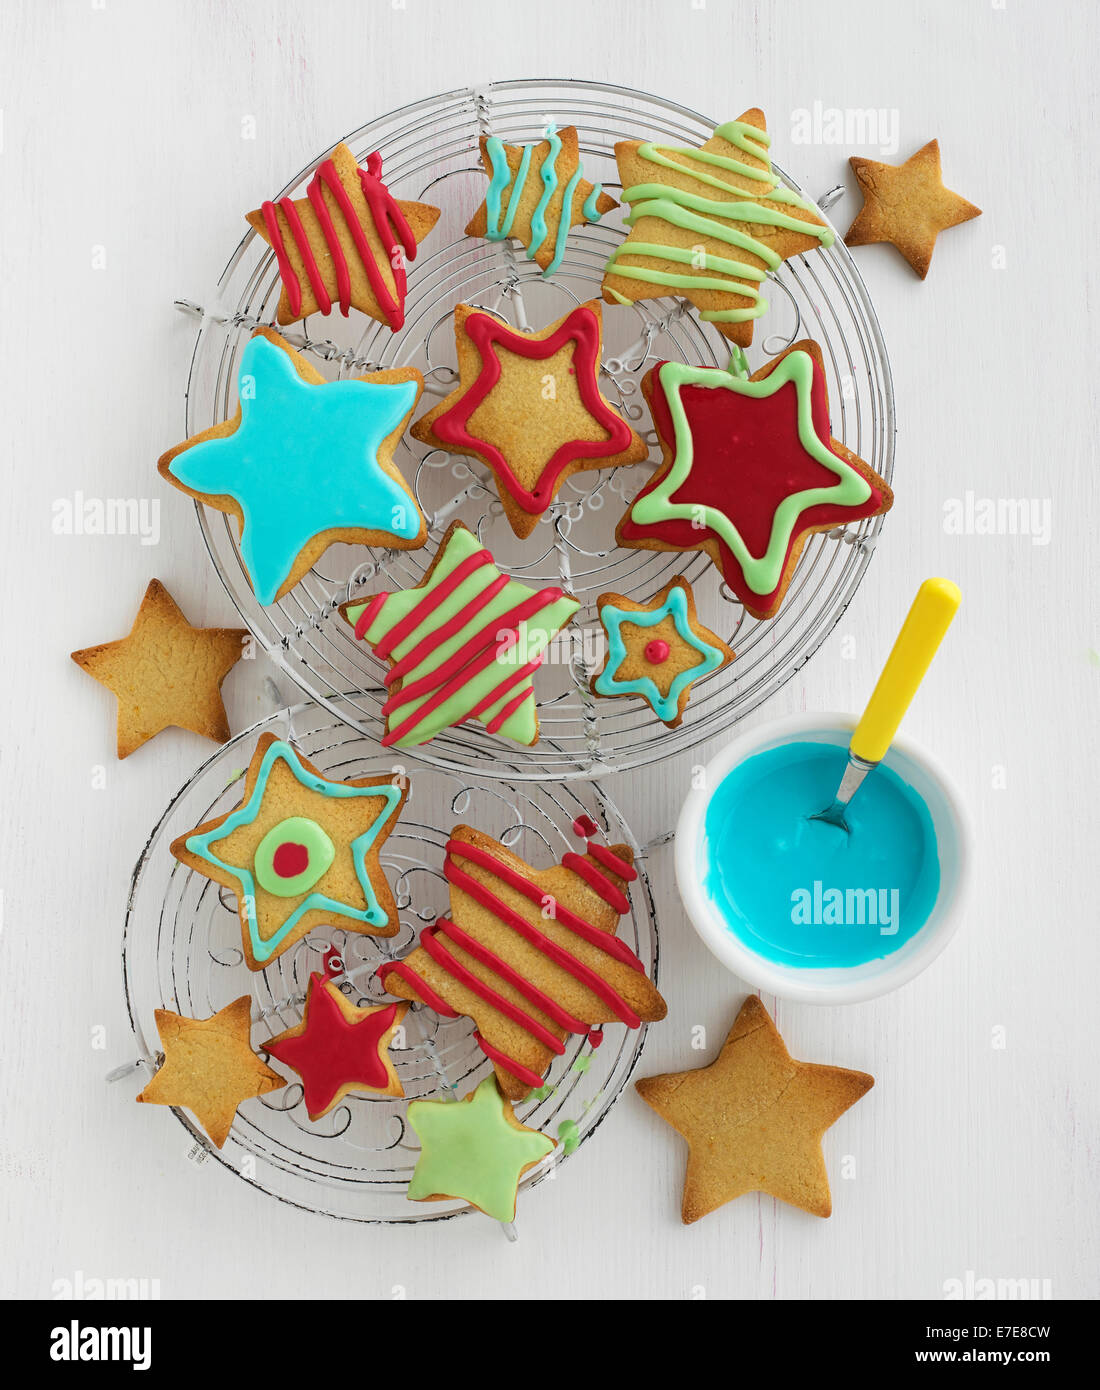 Sternförmig Kekse mit farbigen Zuckerguss Stockbild